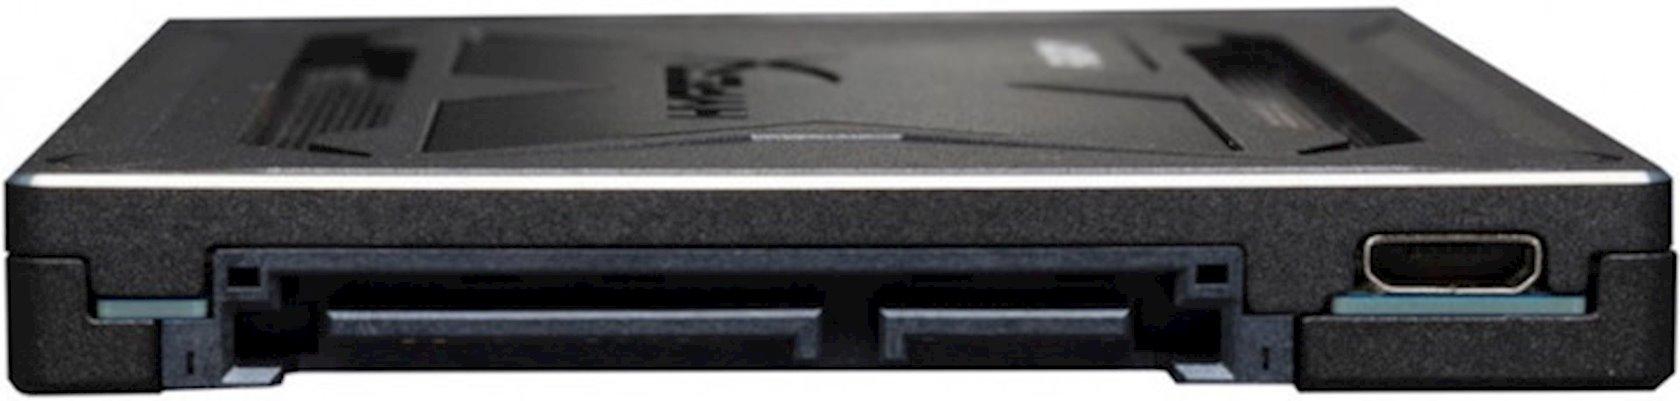 Disk SSD Kingston 480G HyperX Fury SHFR SATA3